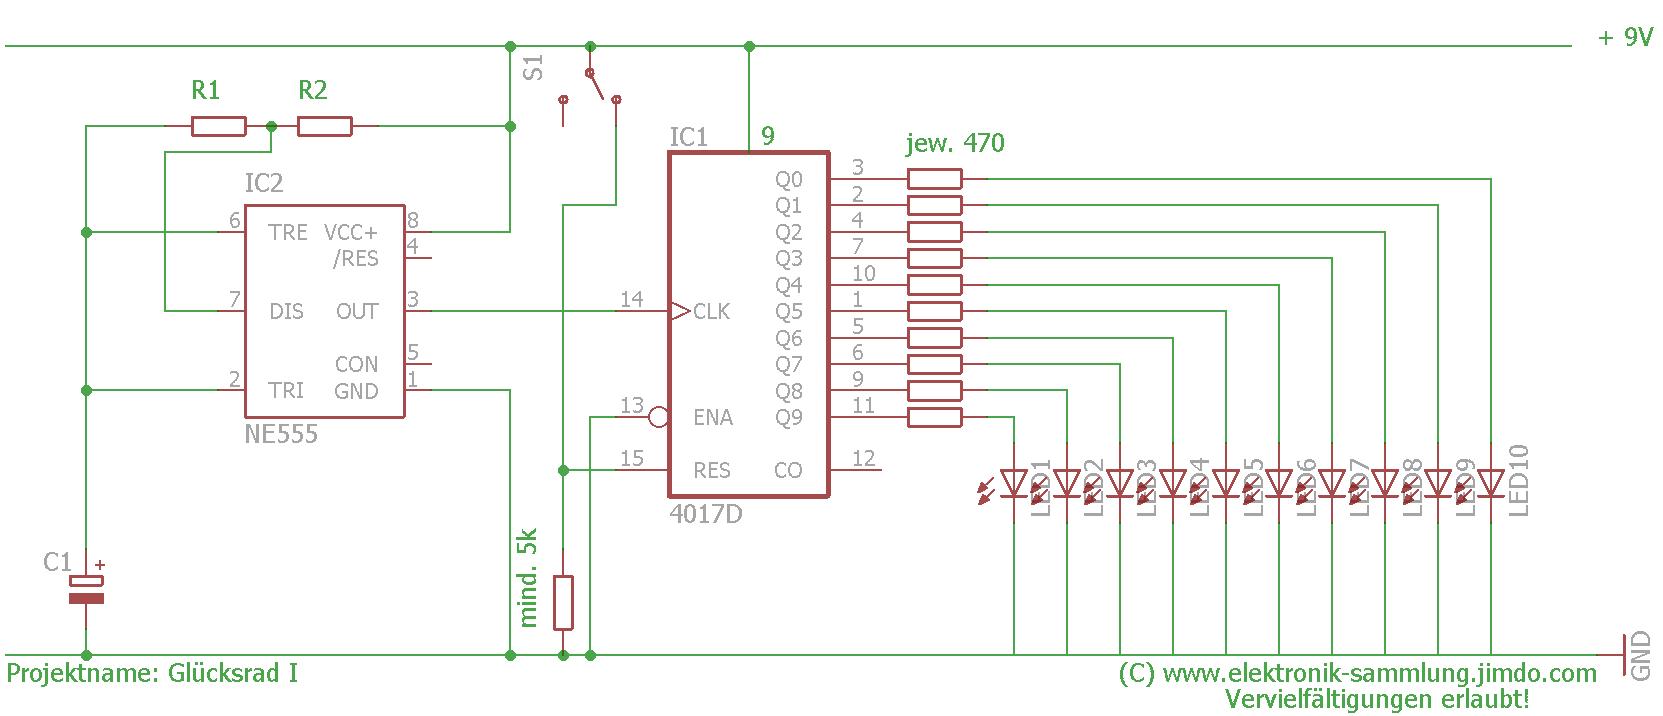 Hinweis: - Elektronik-Sammlung